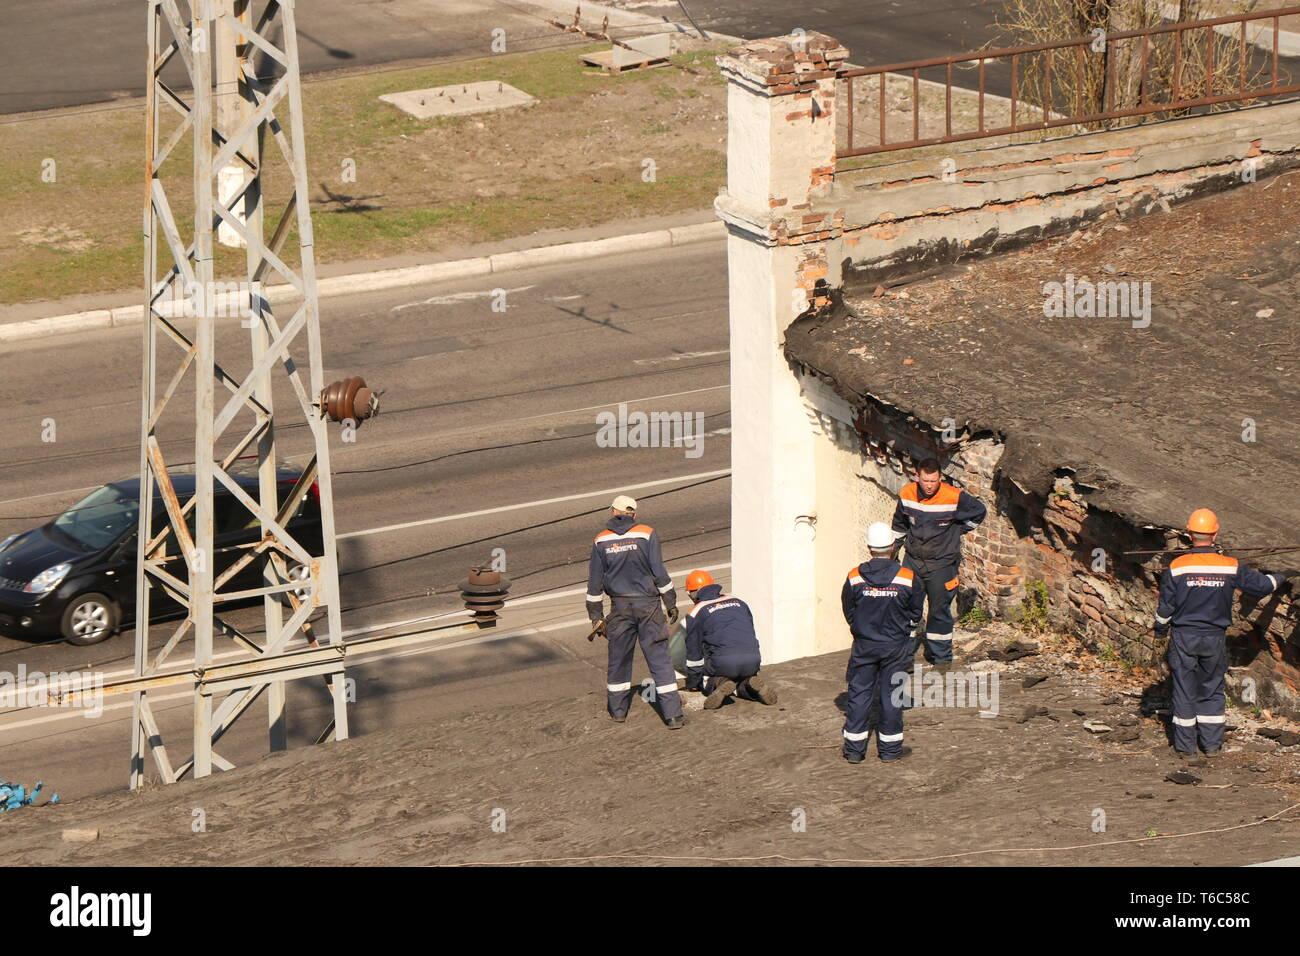 Kremenchug, Poltava region, Ukraine, April 9, 2019, improvement of the city repair of the old roof - Stock Image